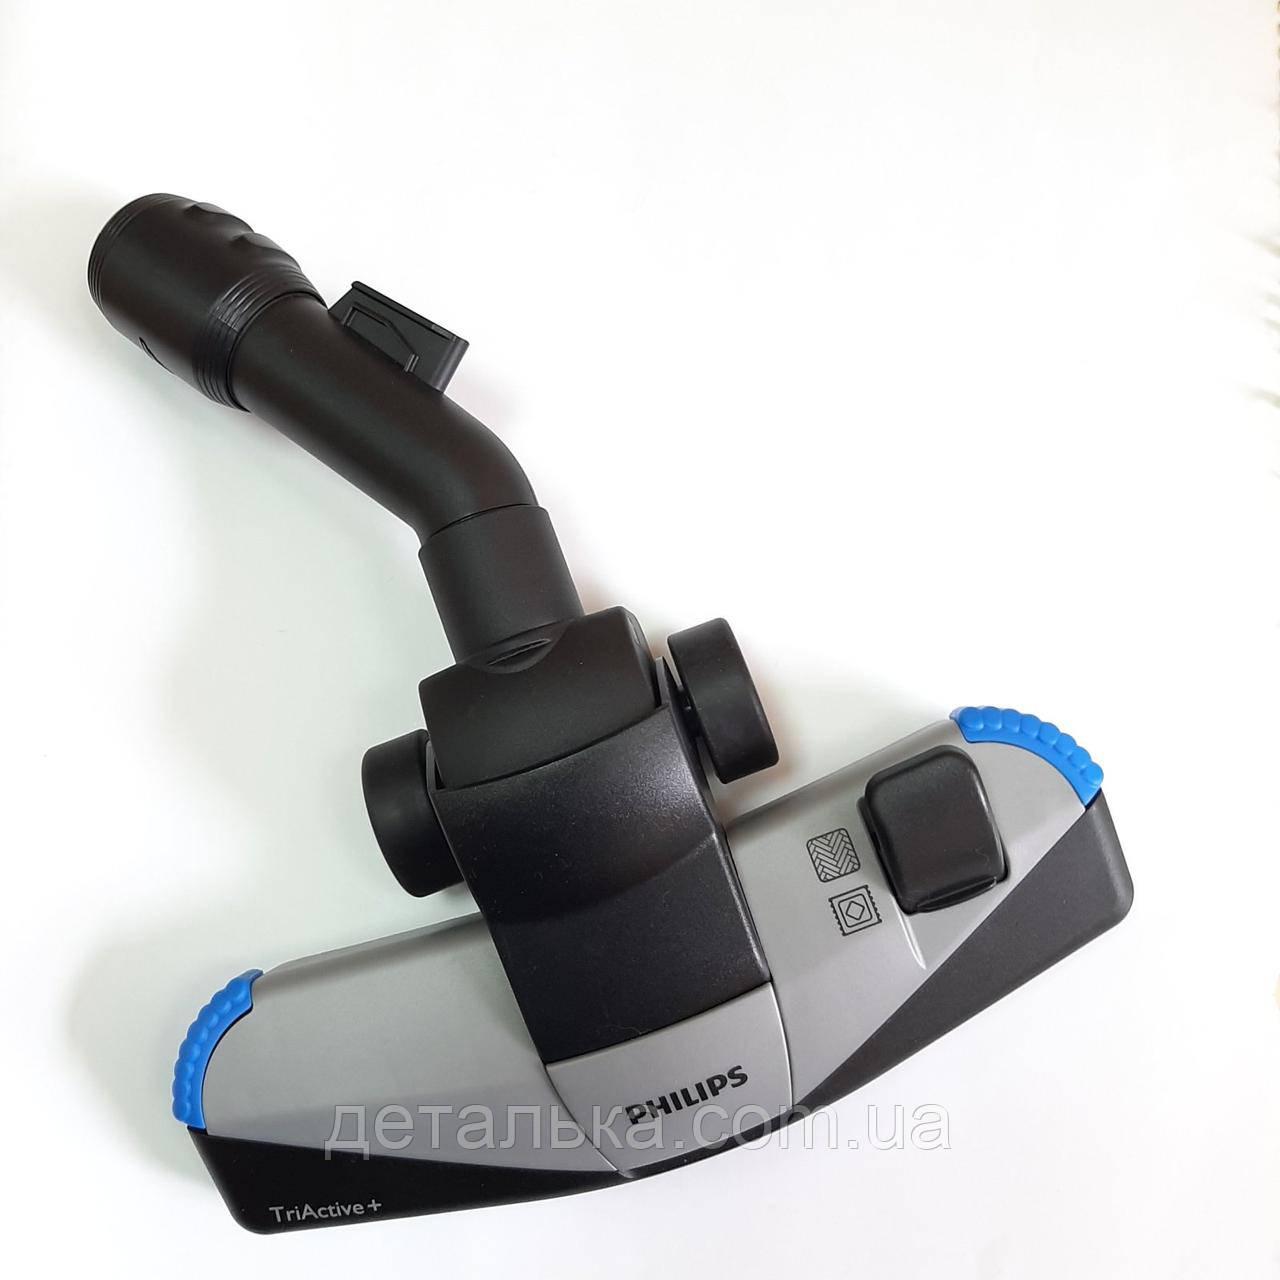 Щетка для пылесоса Philips TRI-ACTIVE NOZZLE